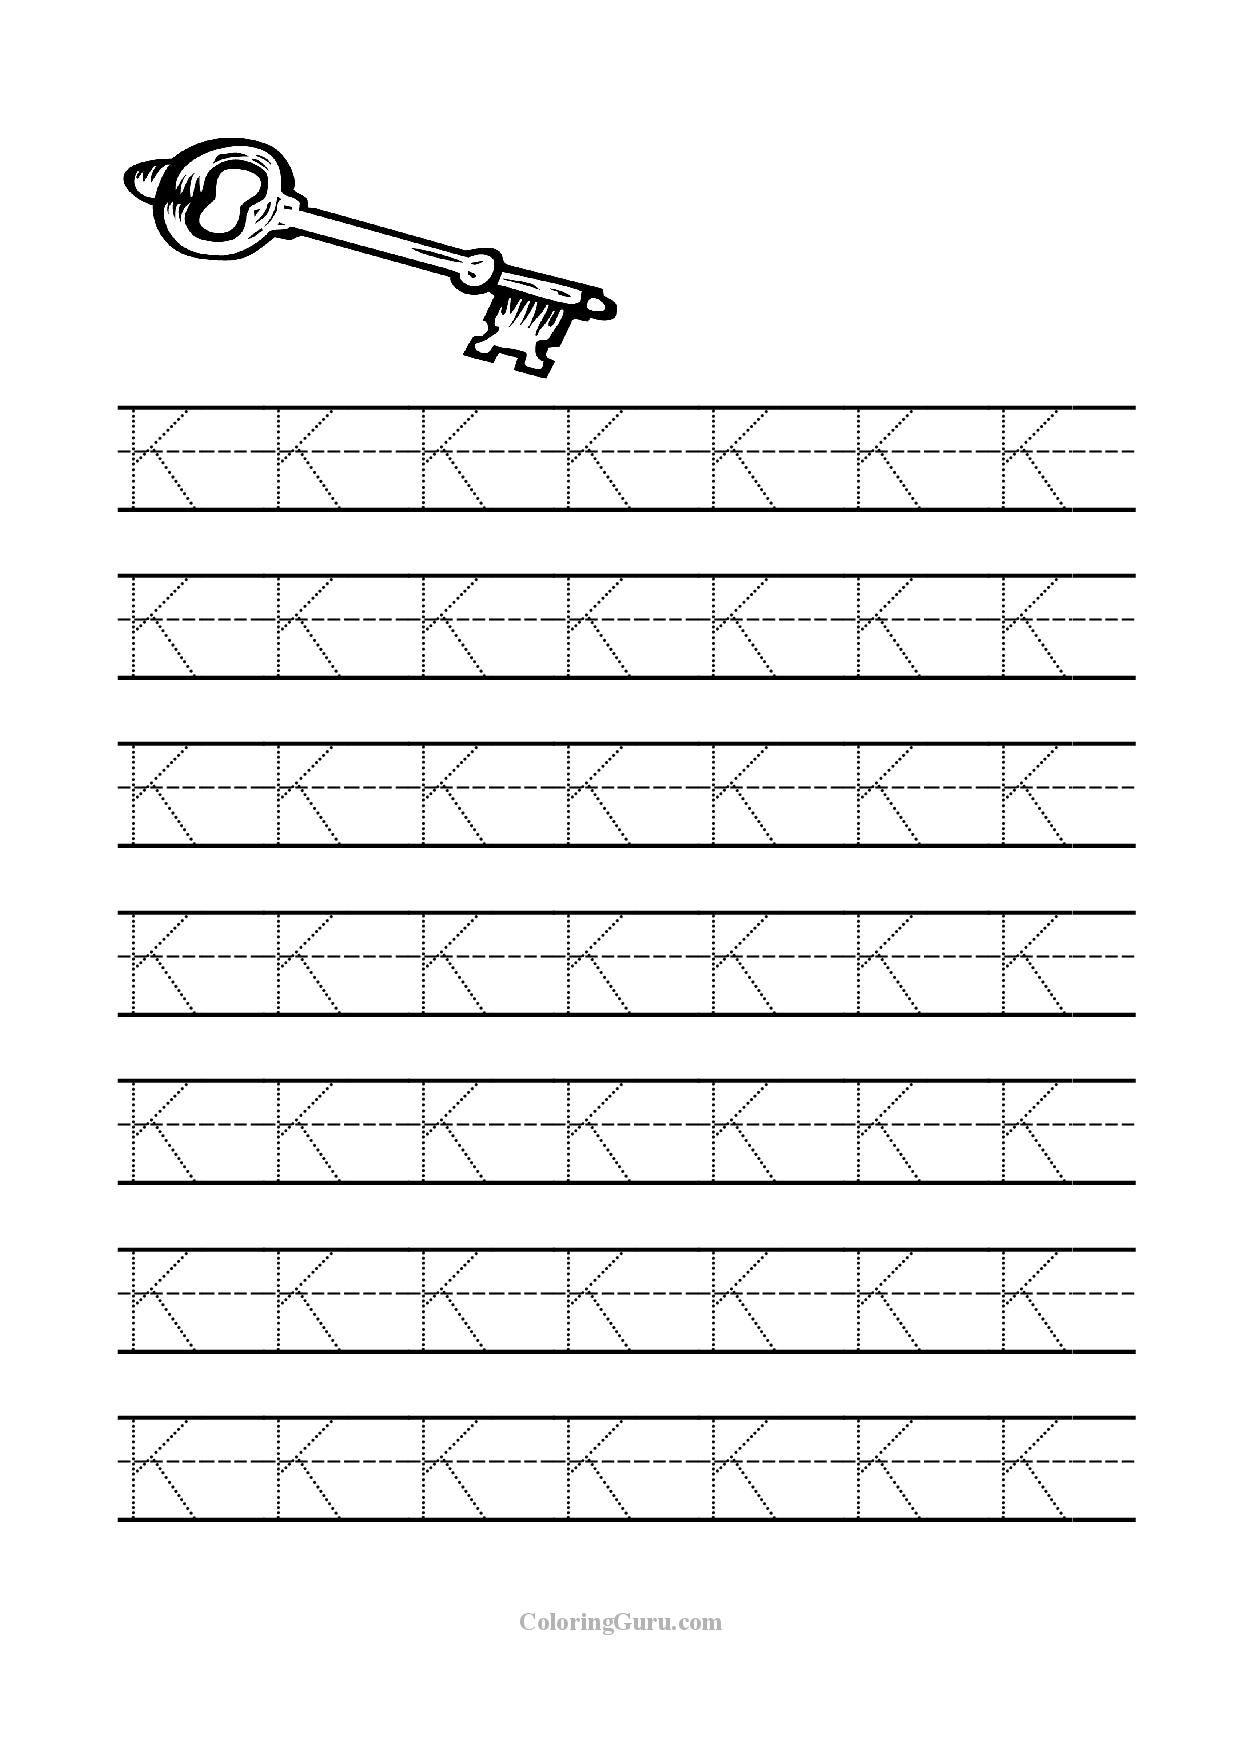 Free Printable Tracing Letter K Worksheets For Preschool intended for Letter K Worksheets Printable